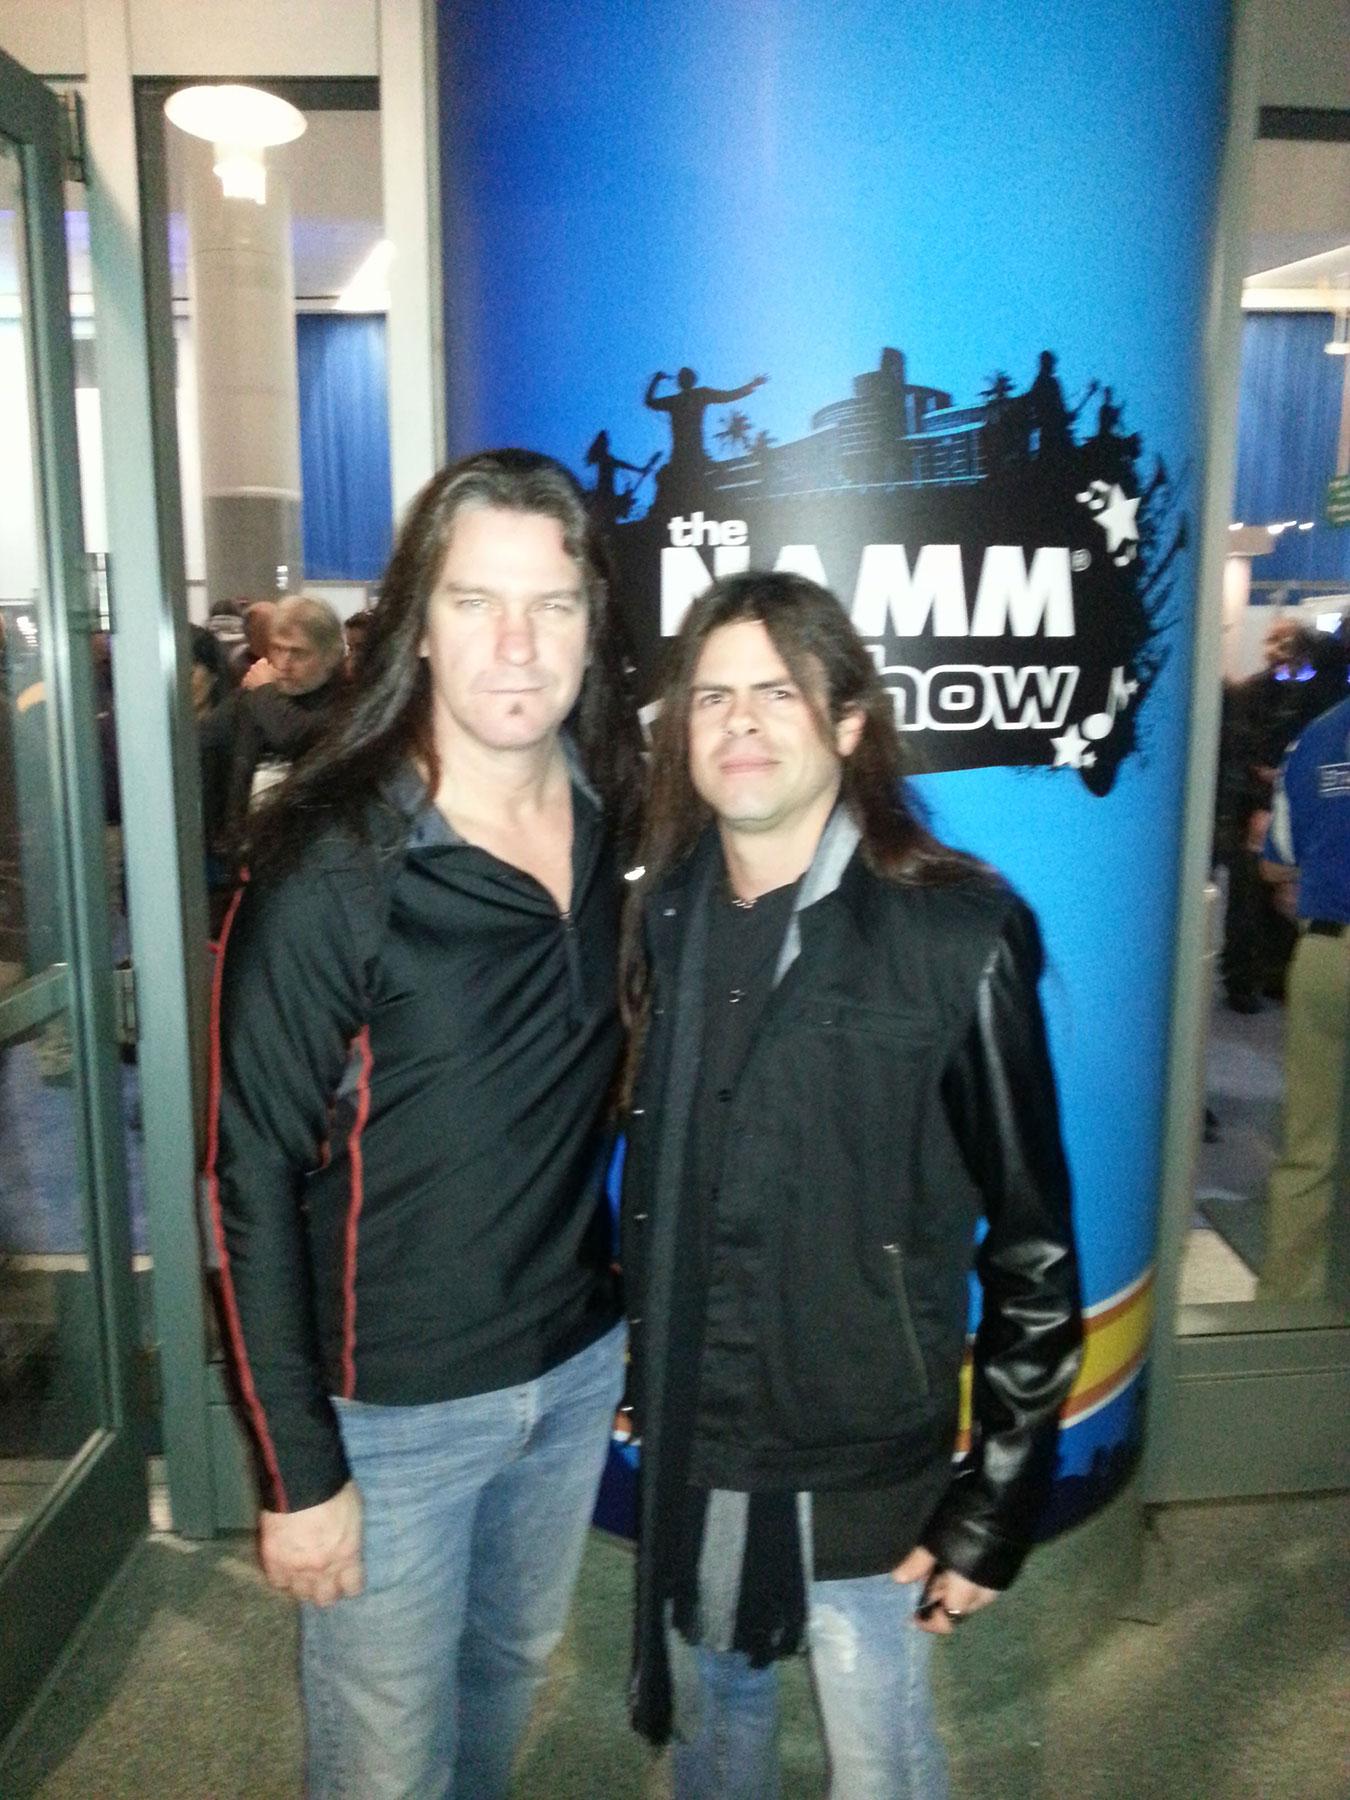 Shawn Drover (Megadeth)